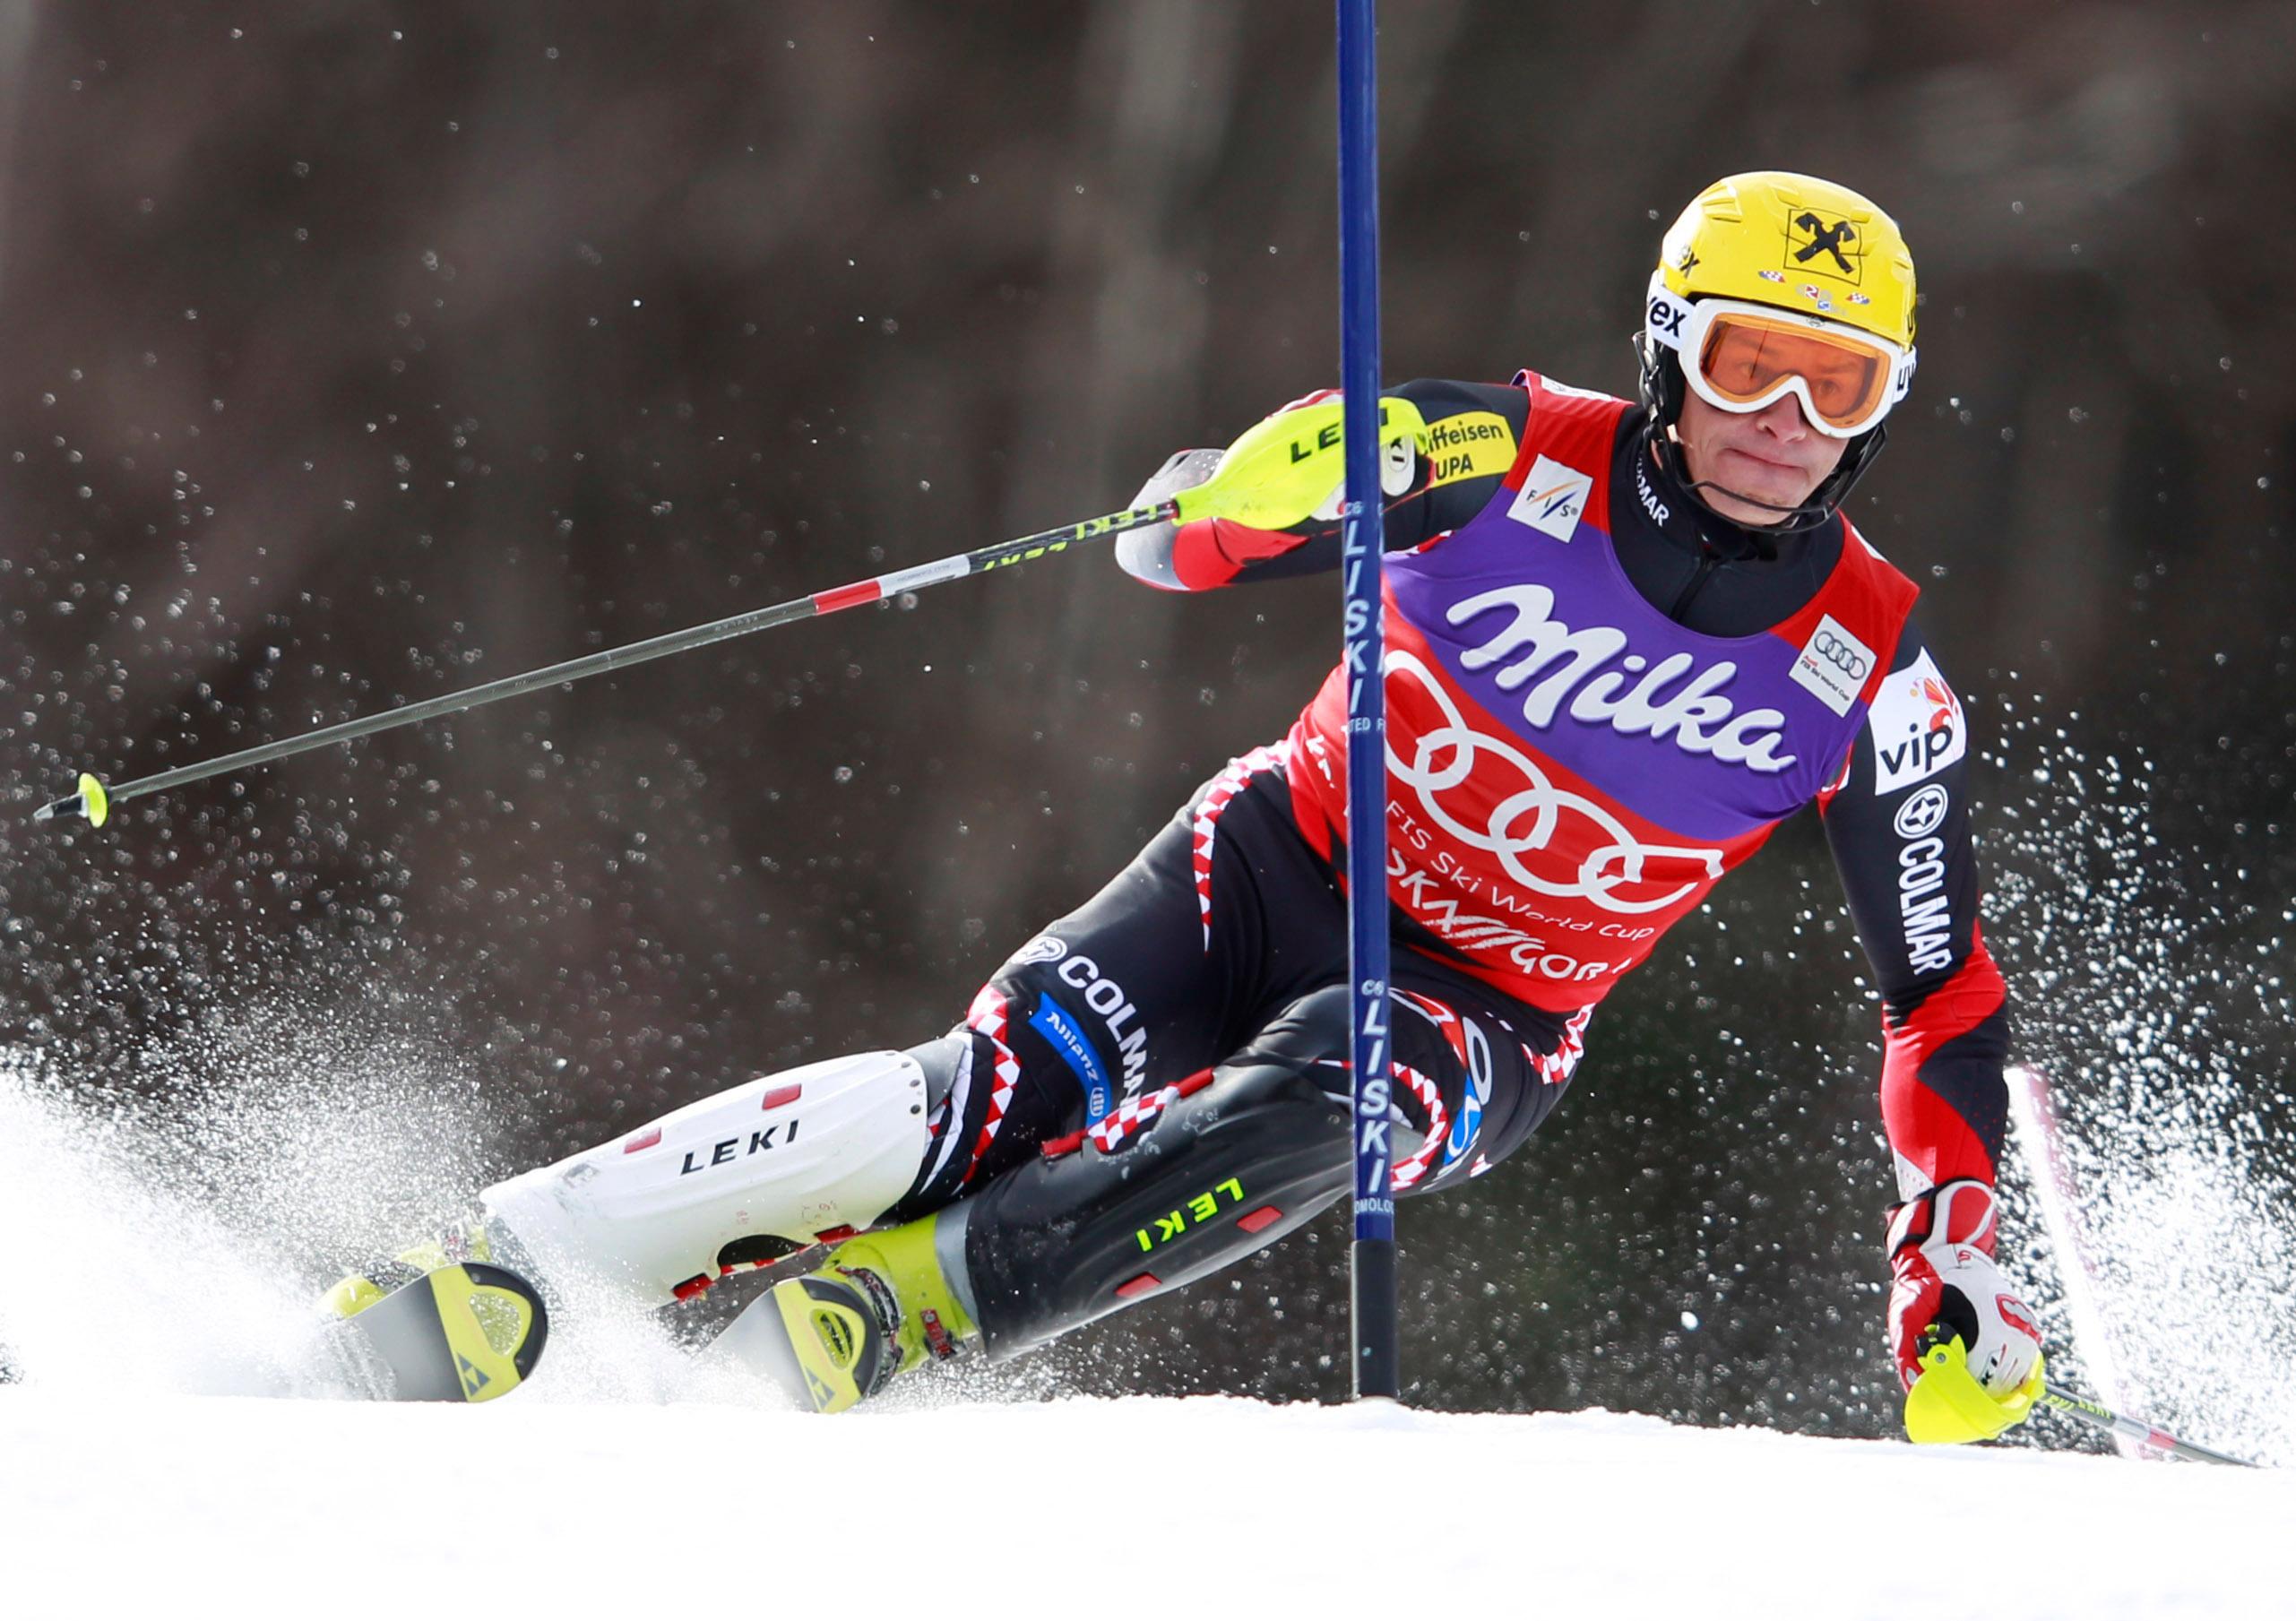 Leki World Cup Pro Shin Guard Skiracing Com